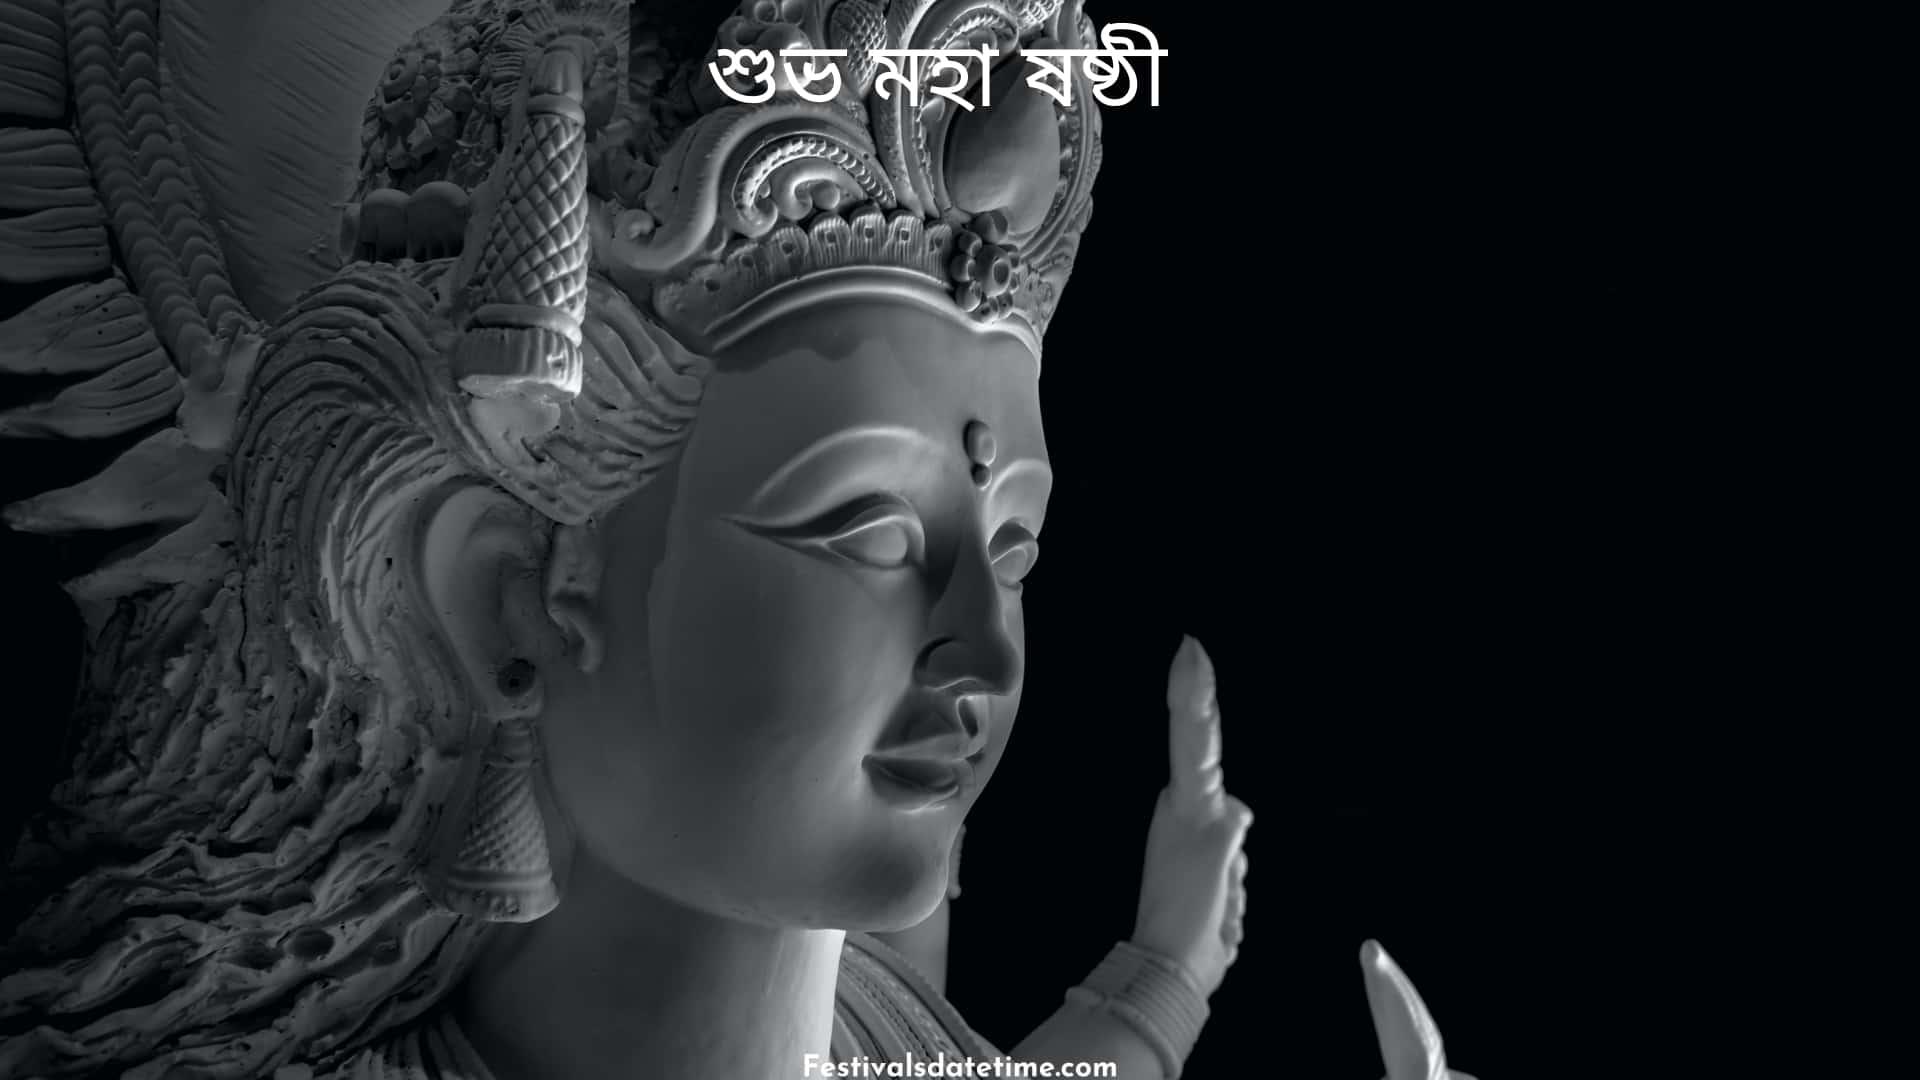 subho_sasthi_image_download